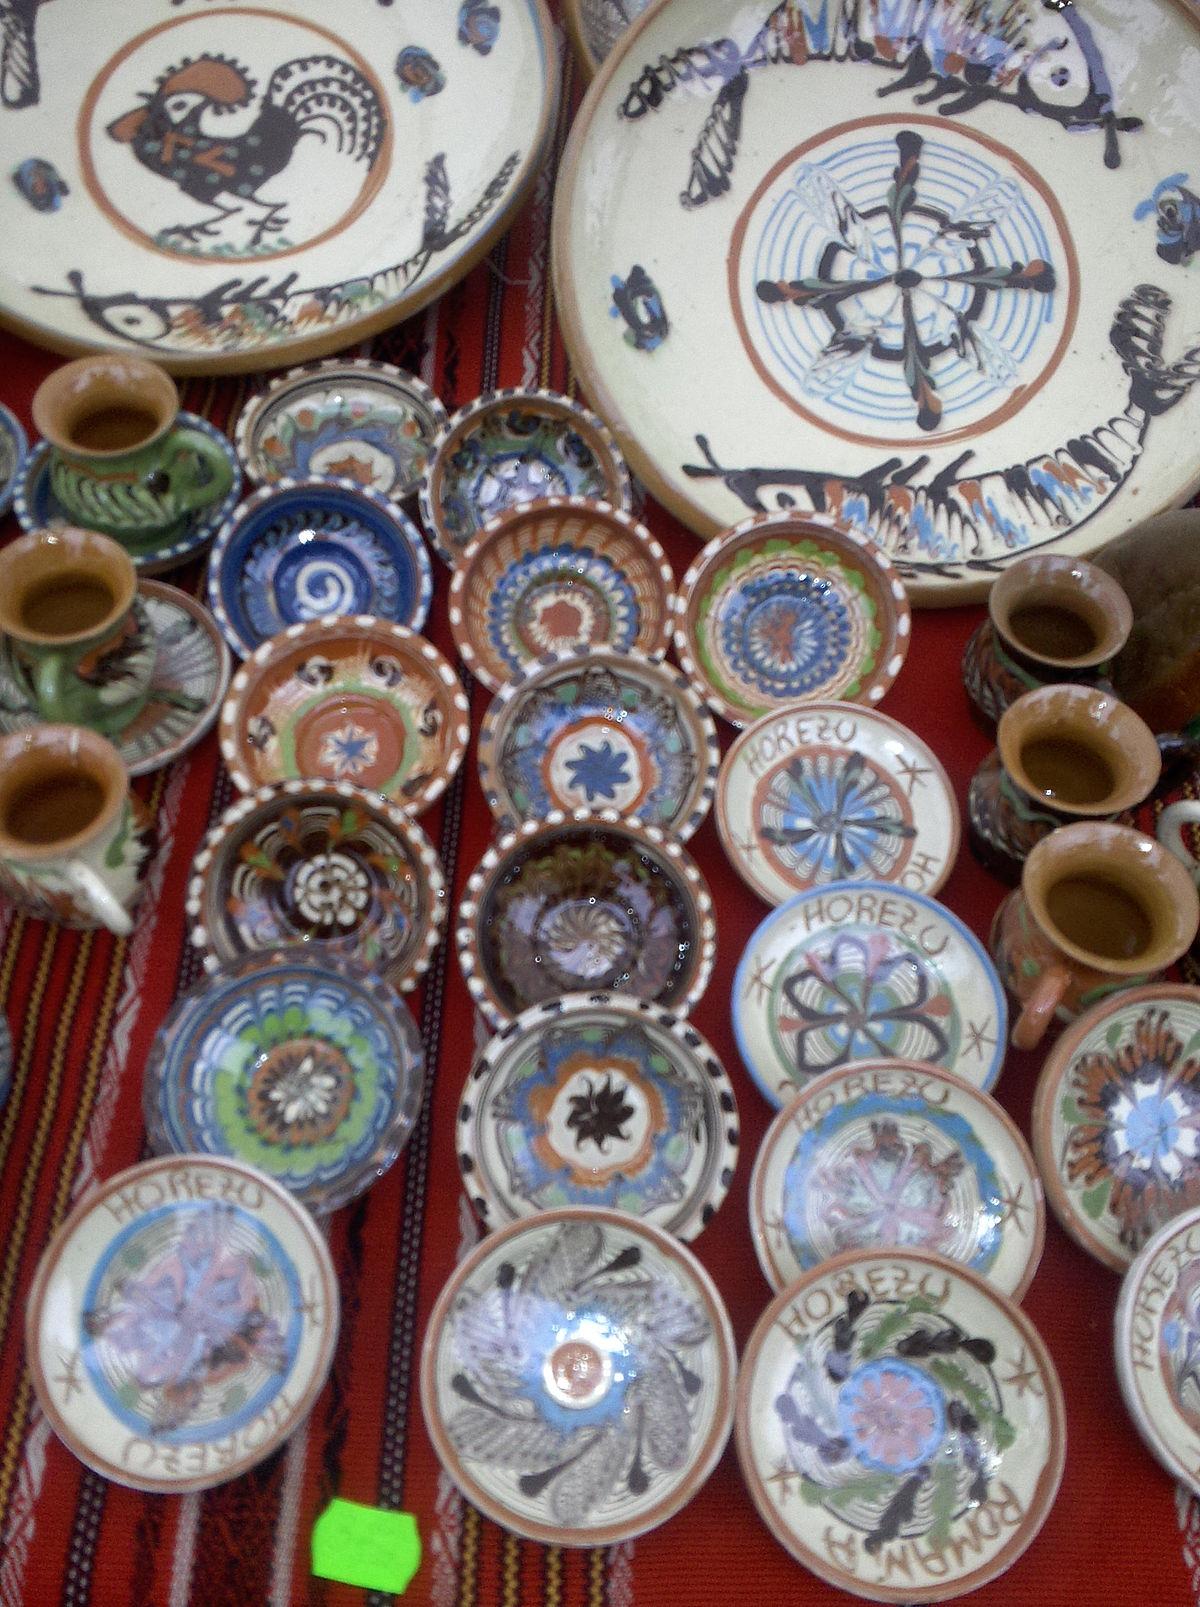 Horezu Ceramics Wikipedia